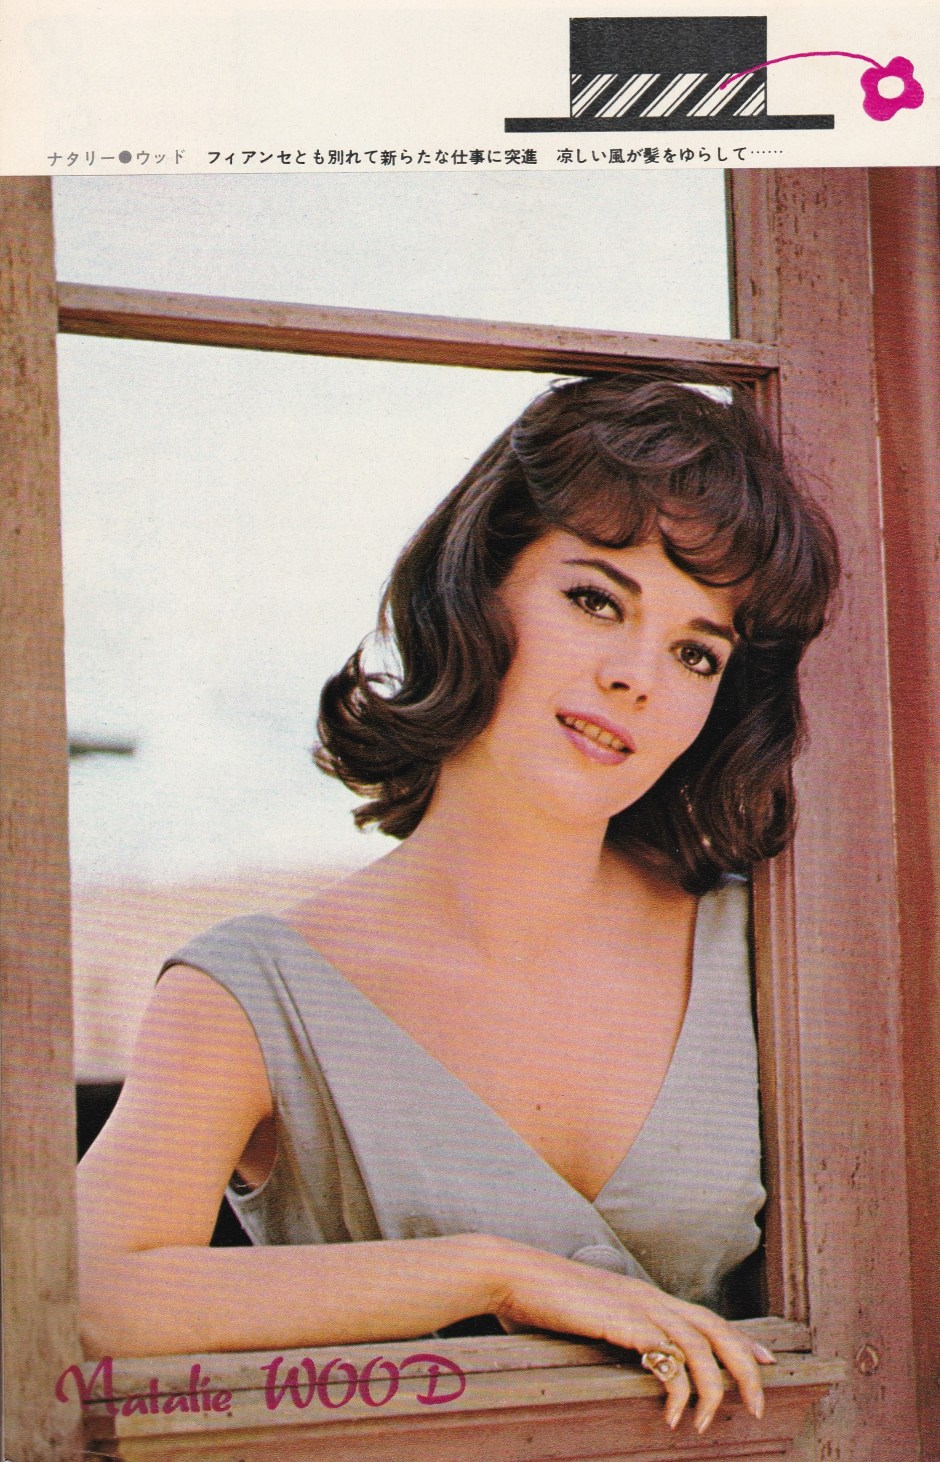 Eiga no Tomo_August 1964_Natalie Wood